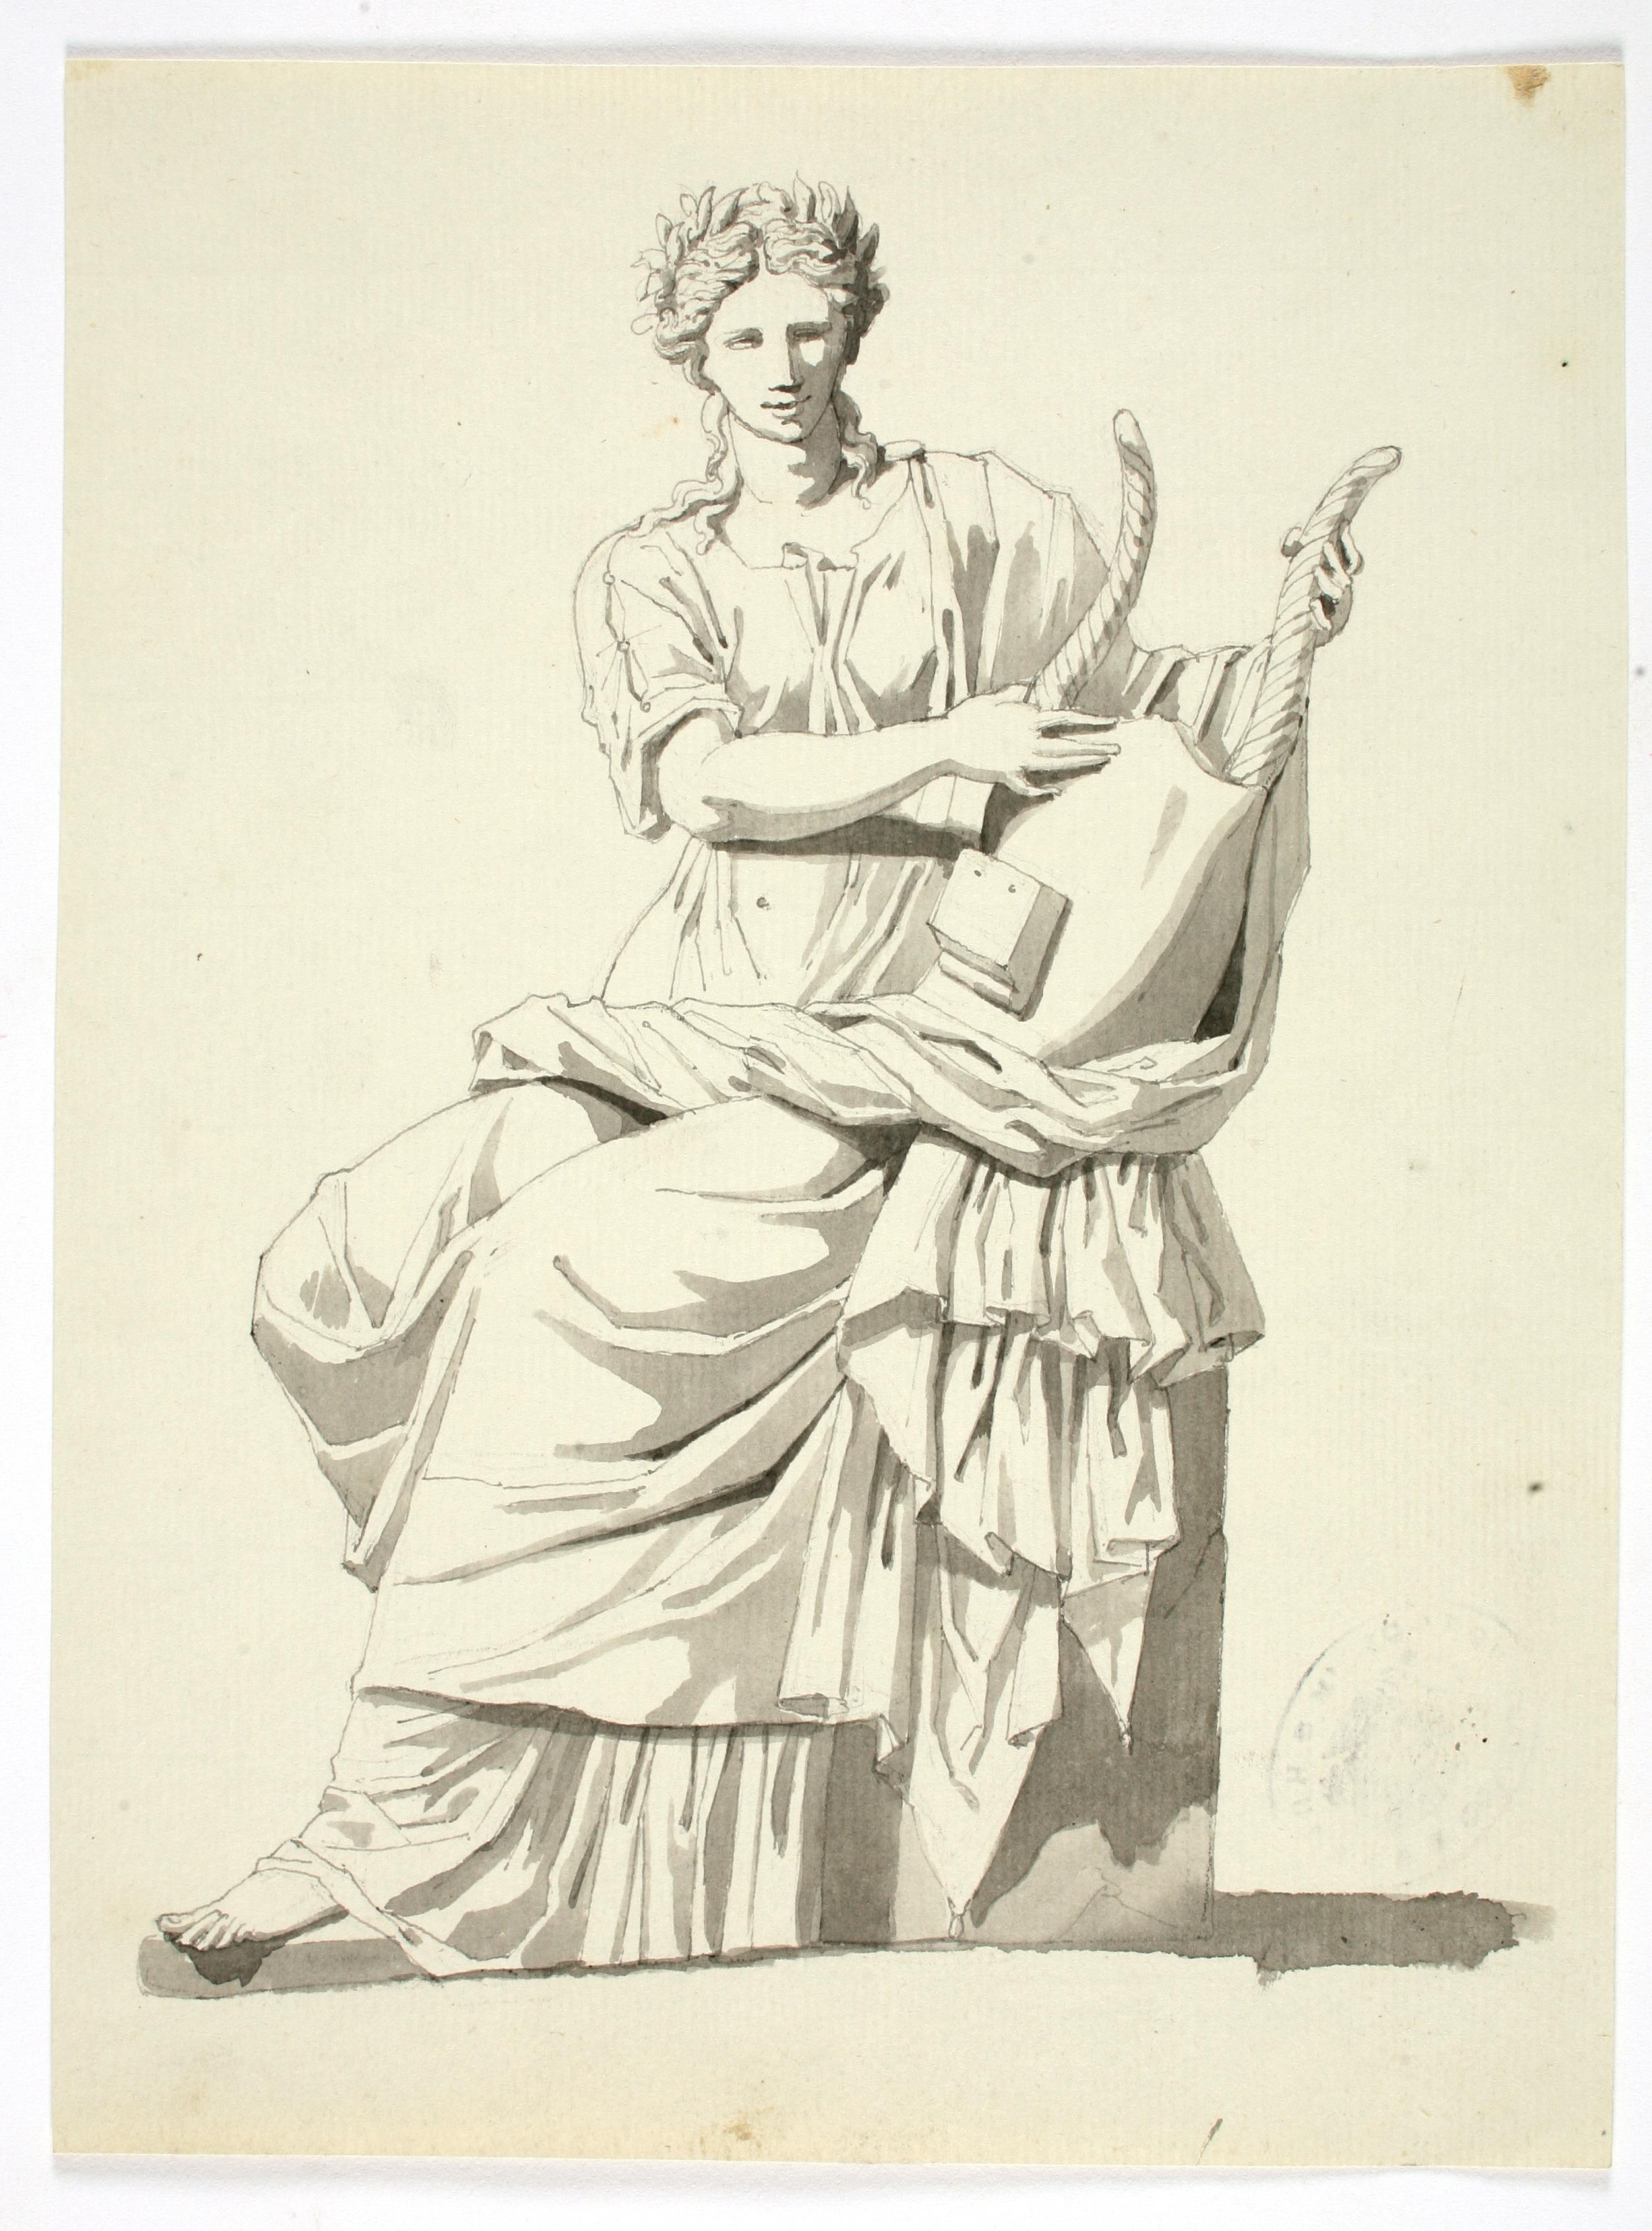 Terpsícore. Valentín Carderera y Solano, ca. 1822-1831. Aguada sobre papel. NIG 01832. Museo de Huesca. Foto Fernando Alvira